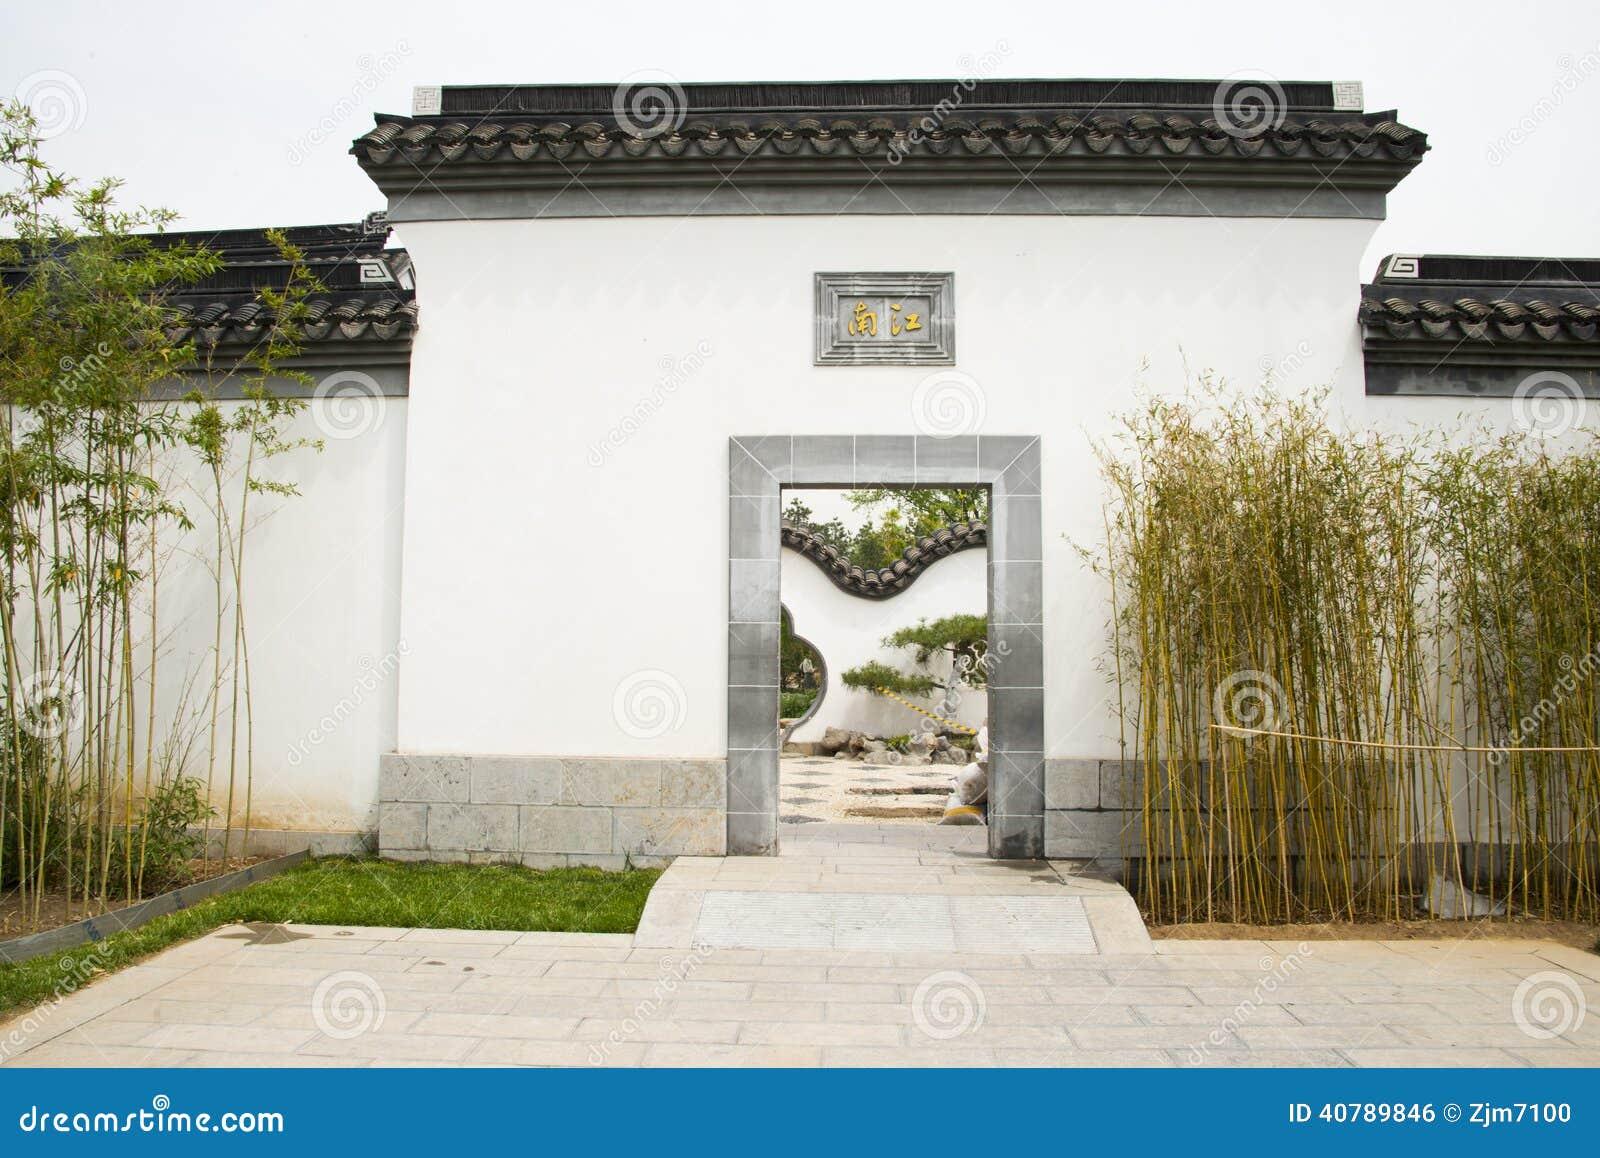 Asiatischer chinese peking garten ausstellungs garten, antike ...